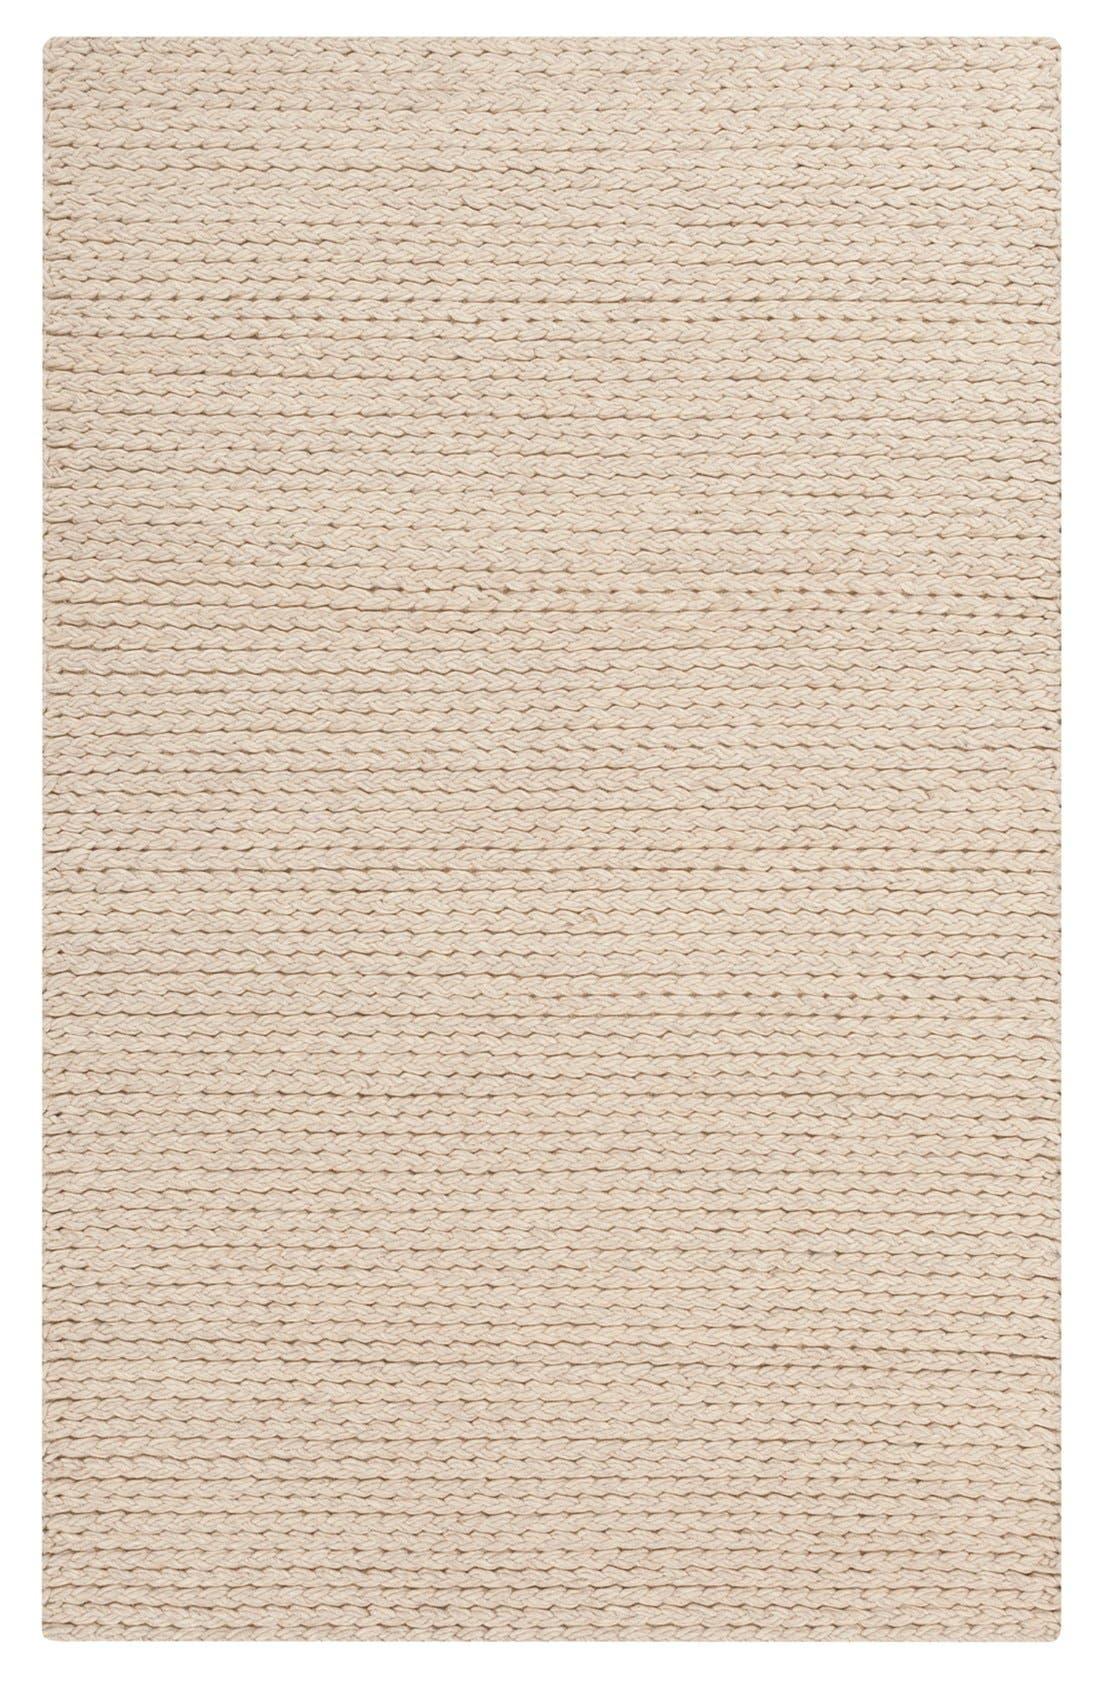 'Yukon' Hand Woven Wool Rug,                         Main,                         color, Beige